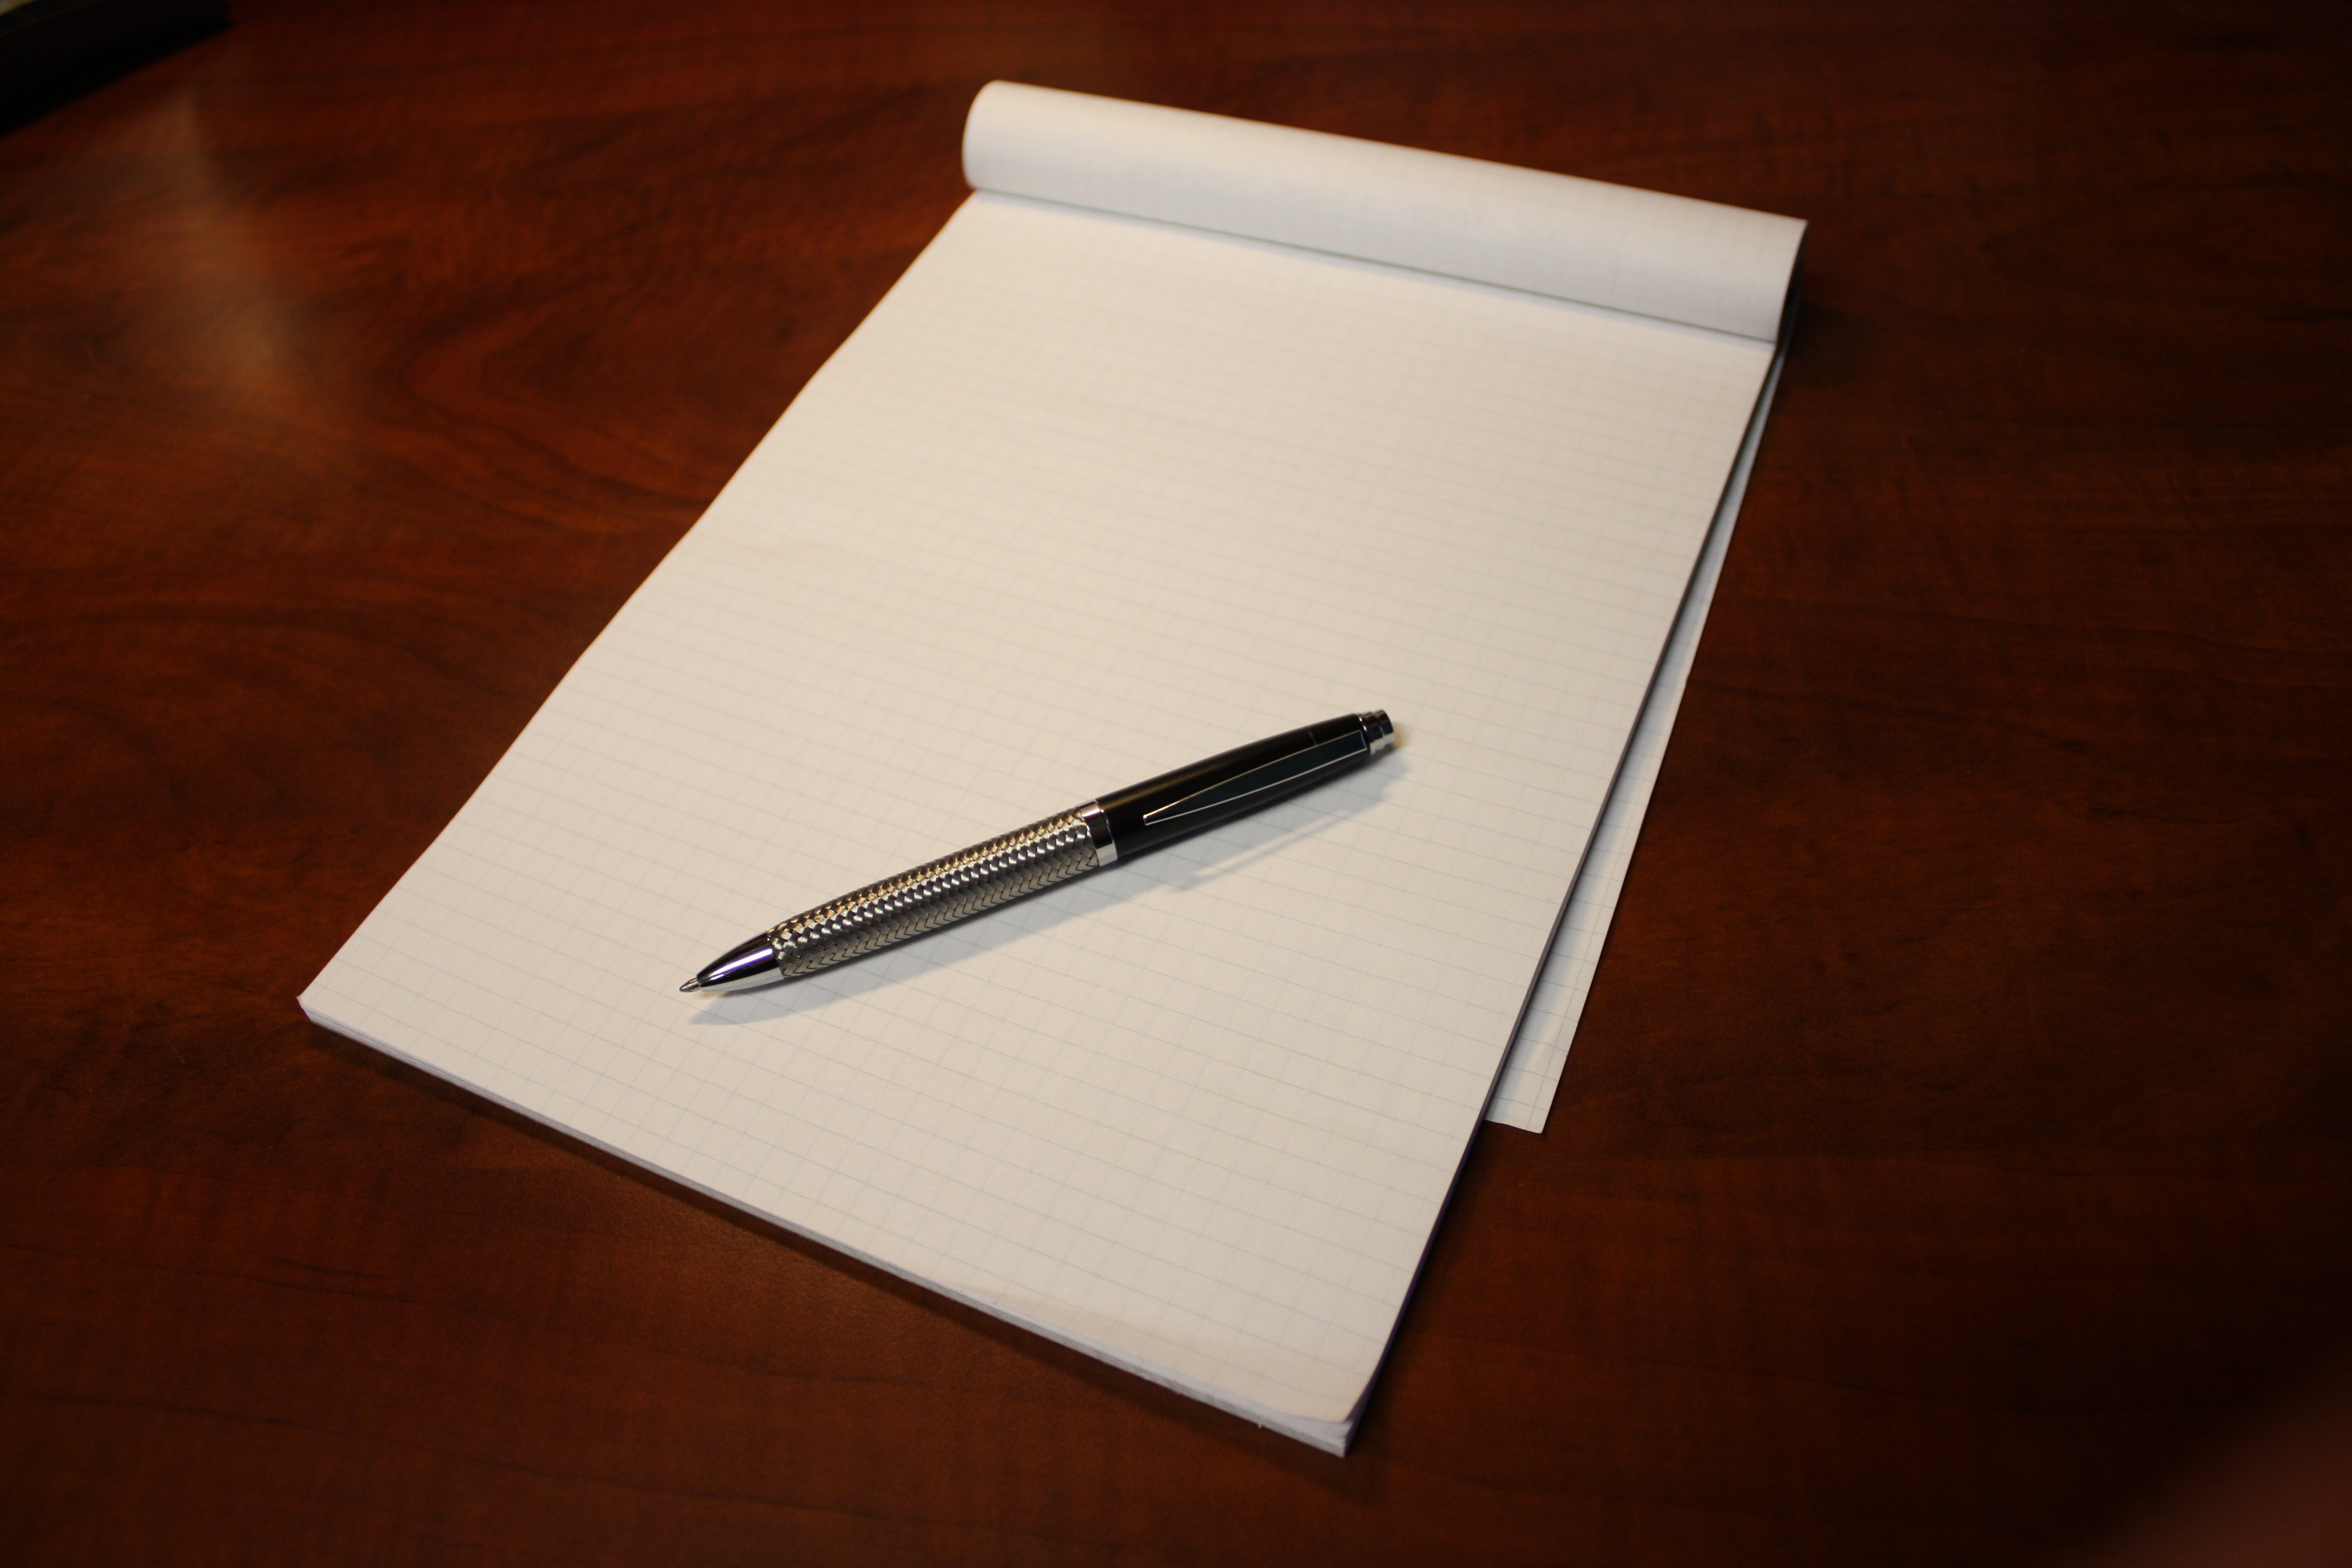 pen on legal pad